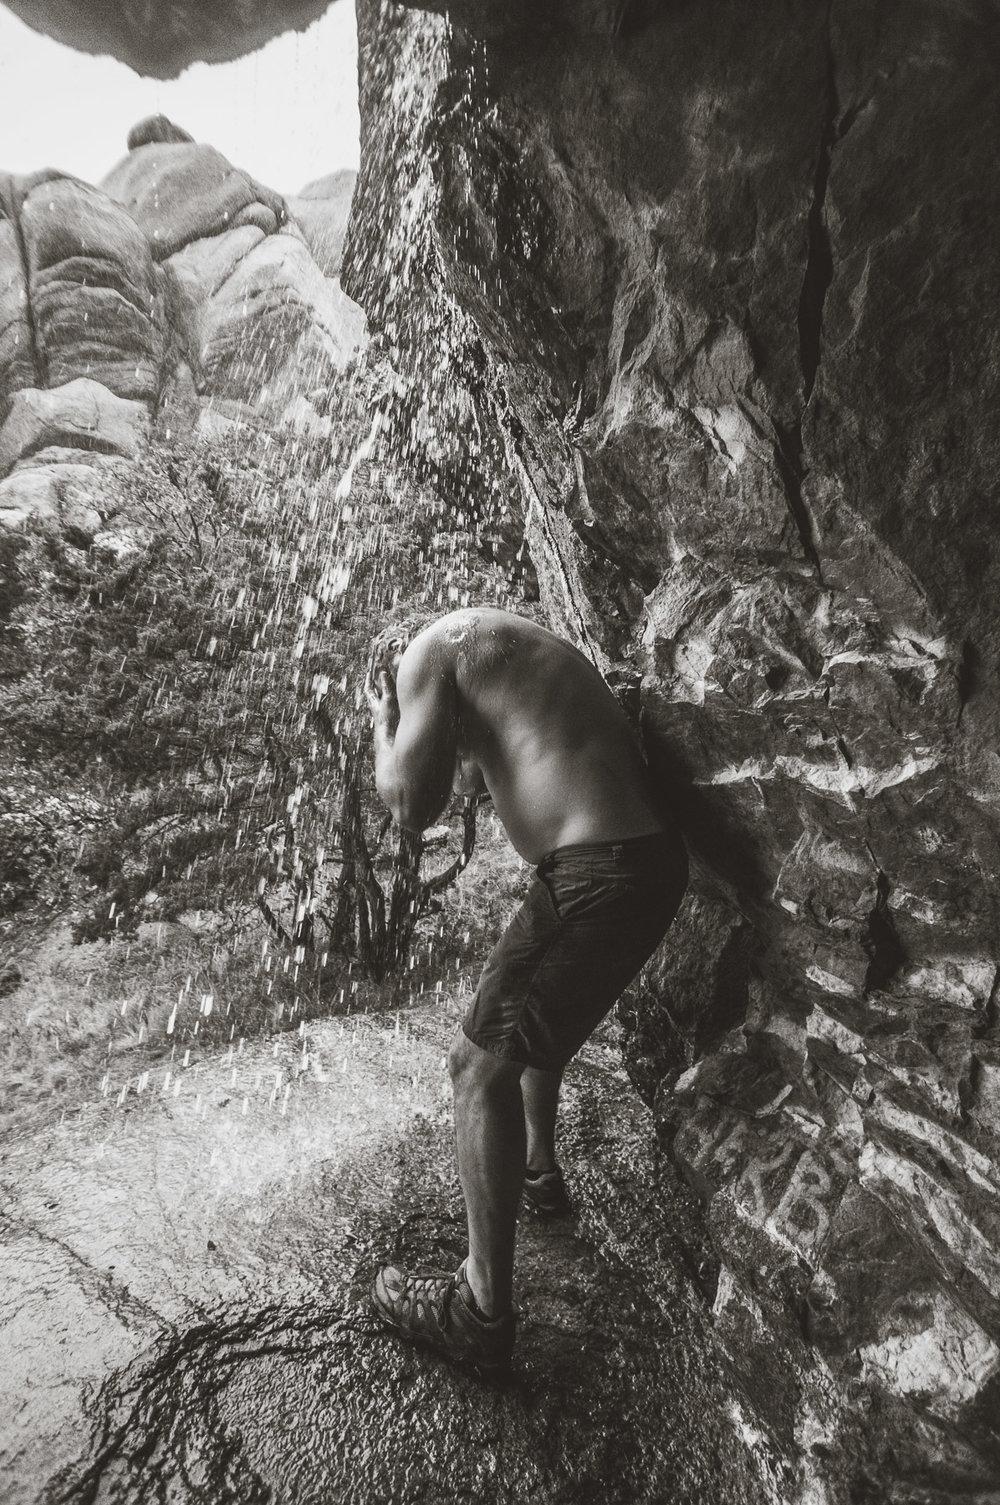 Spanish Cave 11-6-16 (17 of 19).JPG